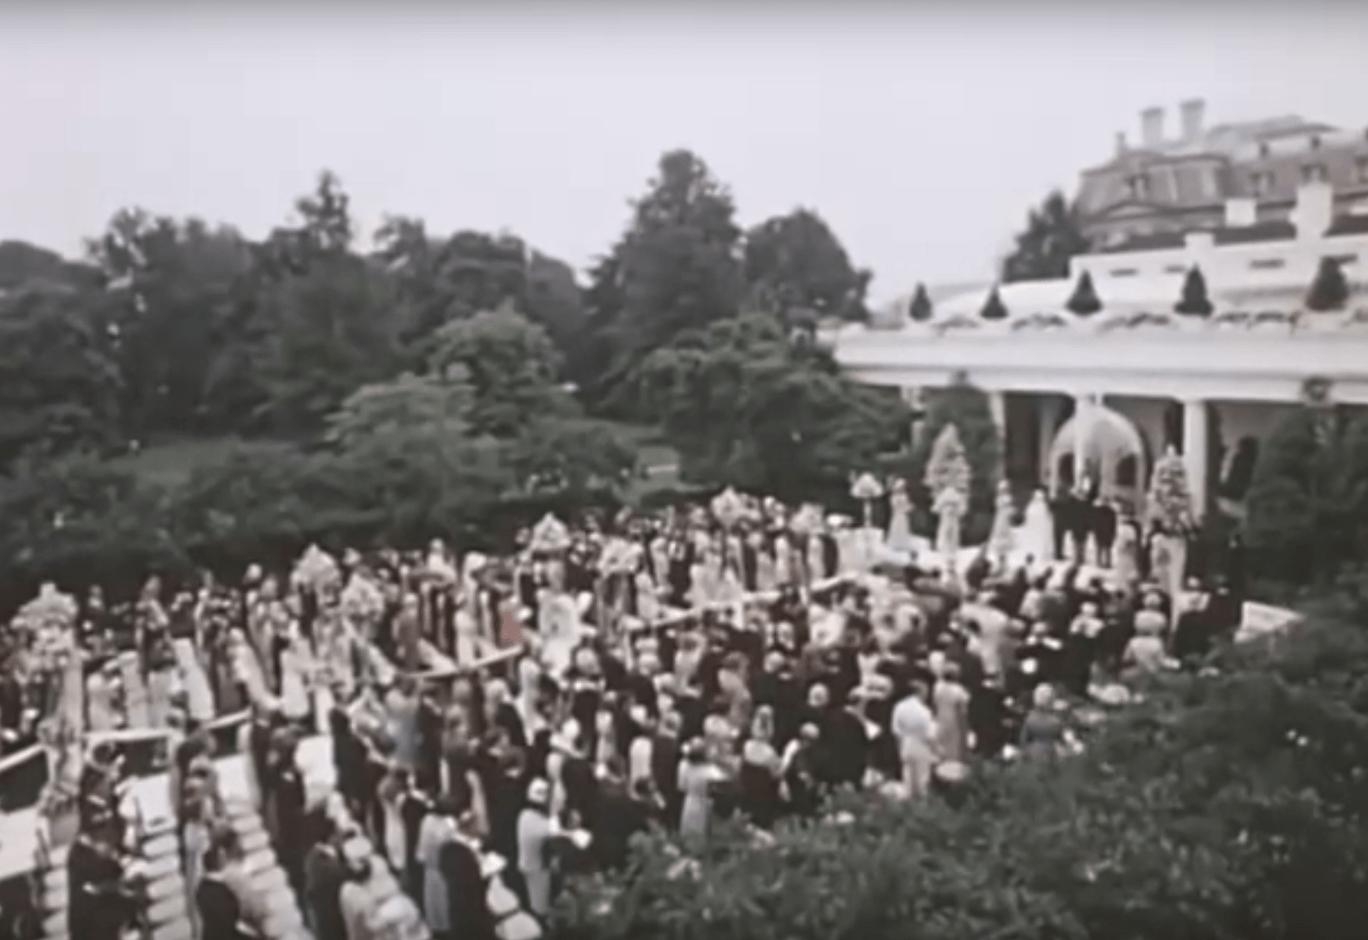 Patricia Nixon wedding rose garden